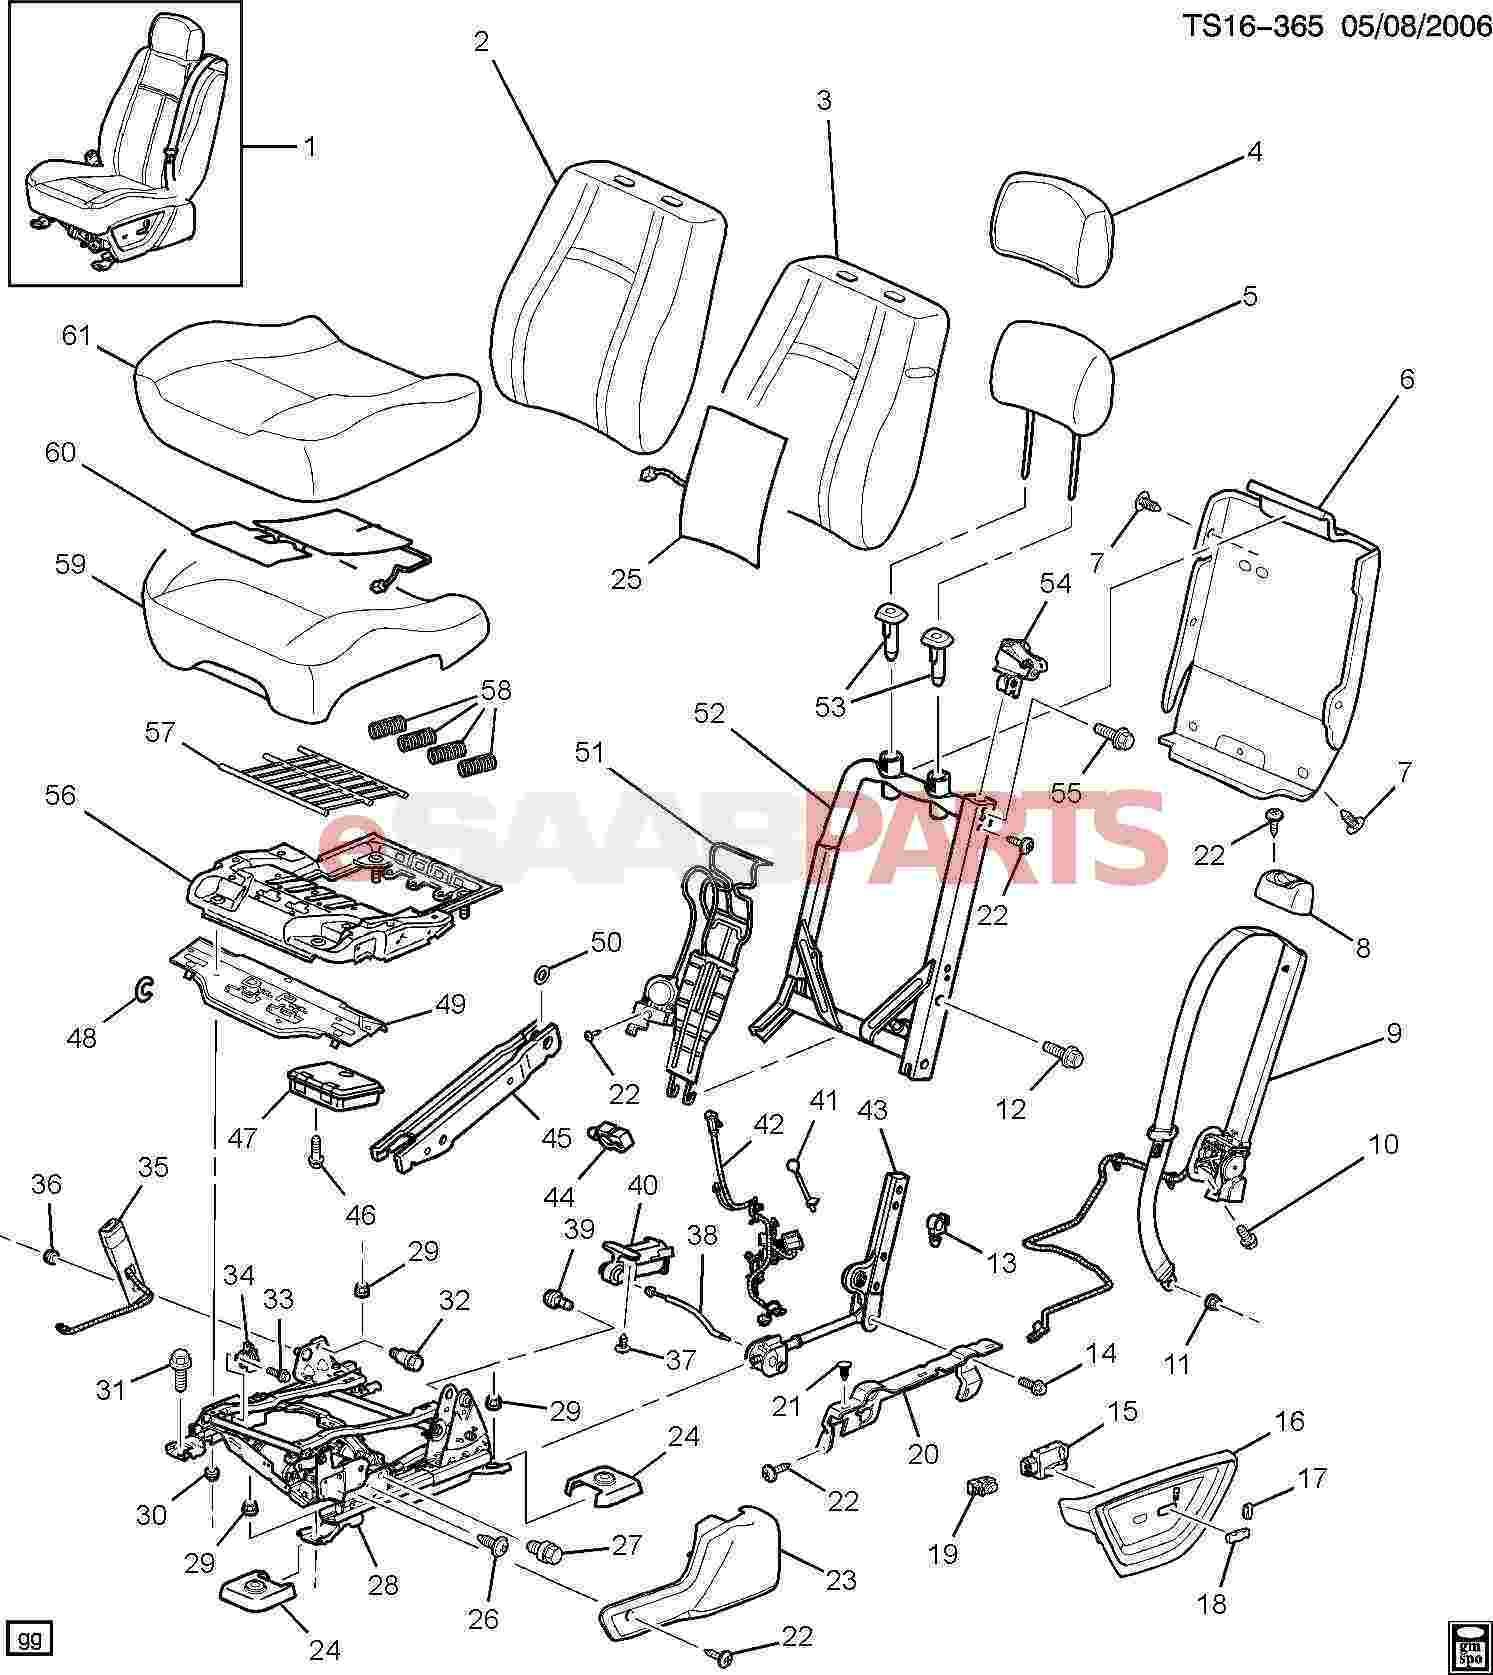 Saab Cover D Seat Otr Adjr Upper Fin